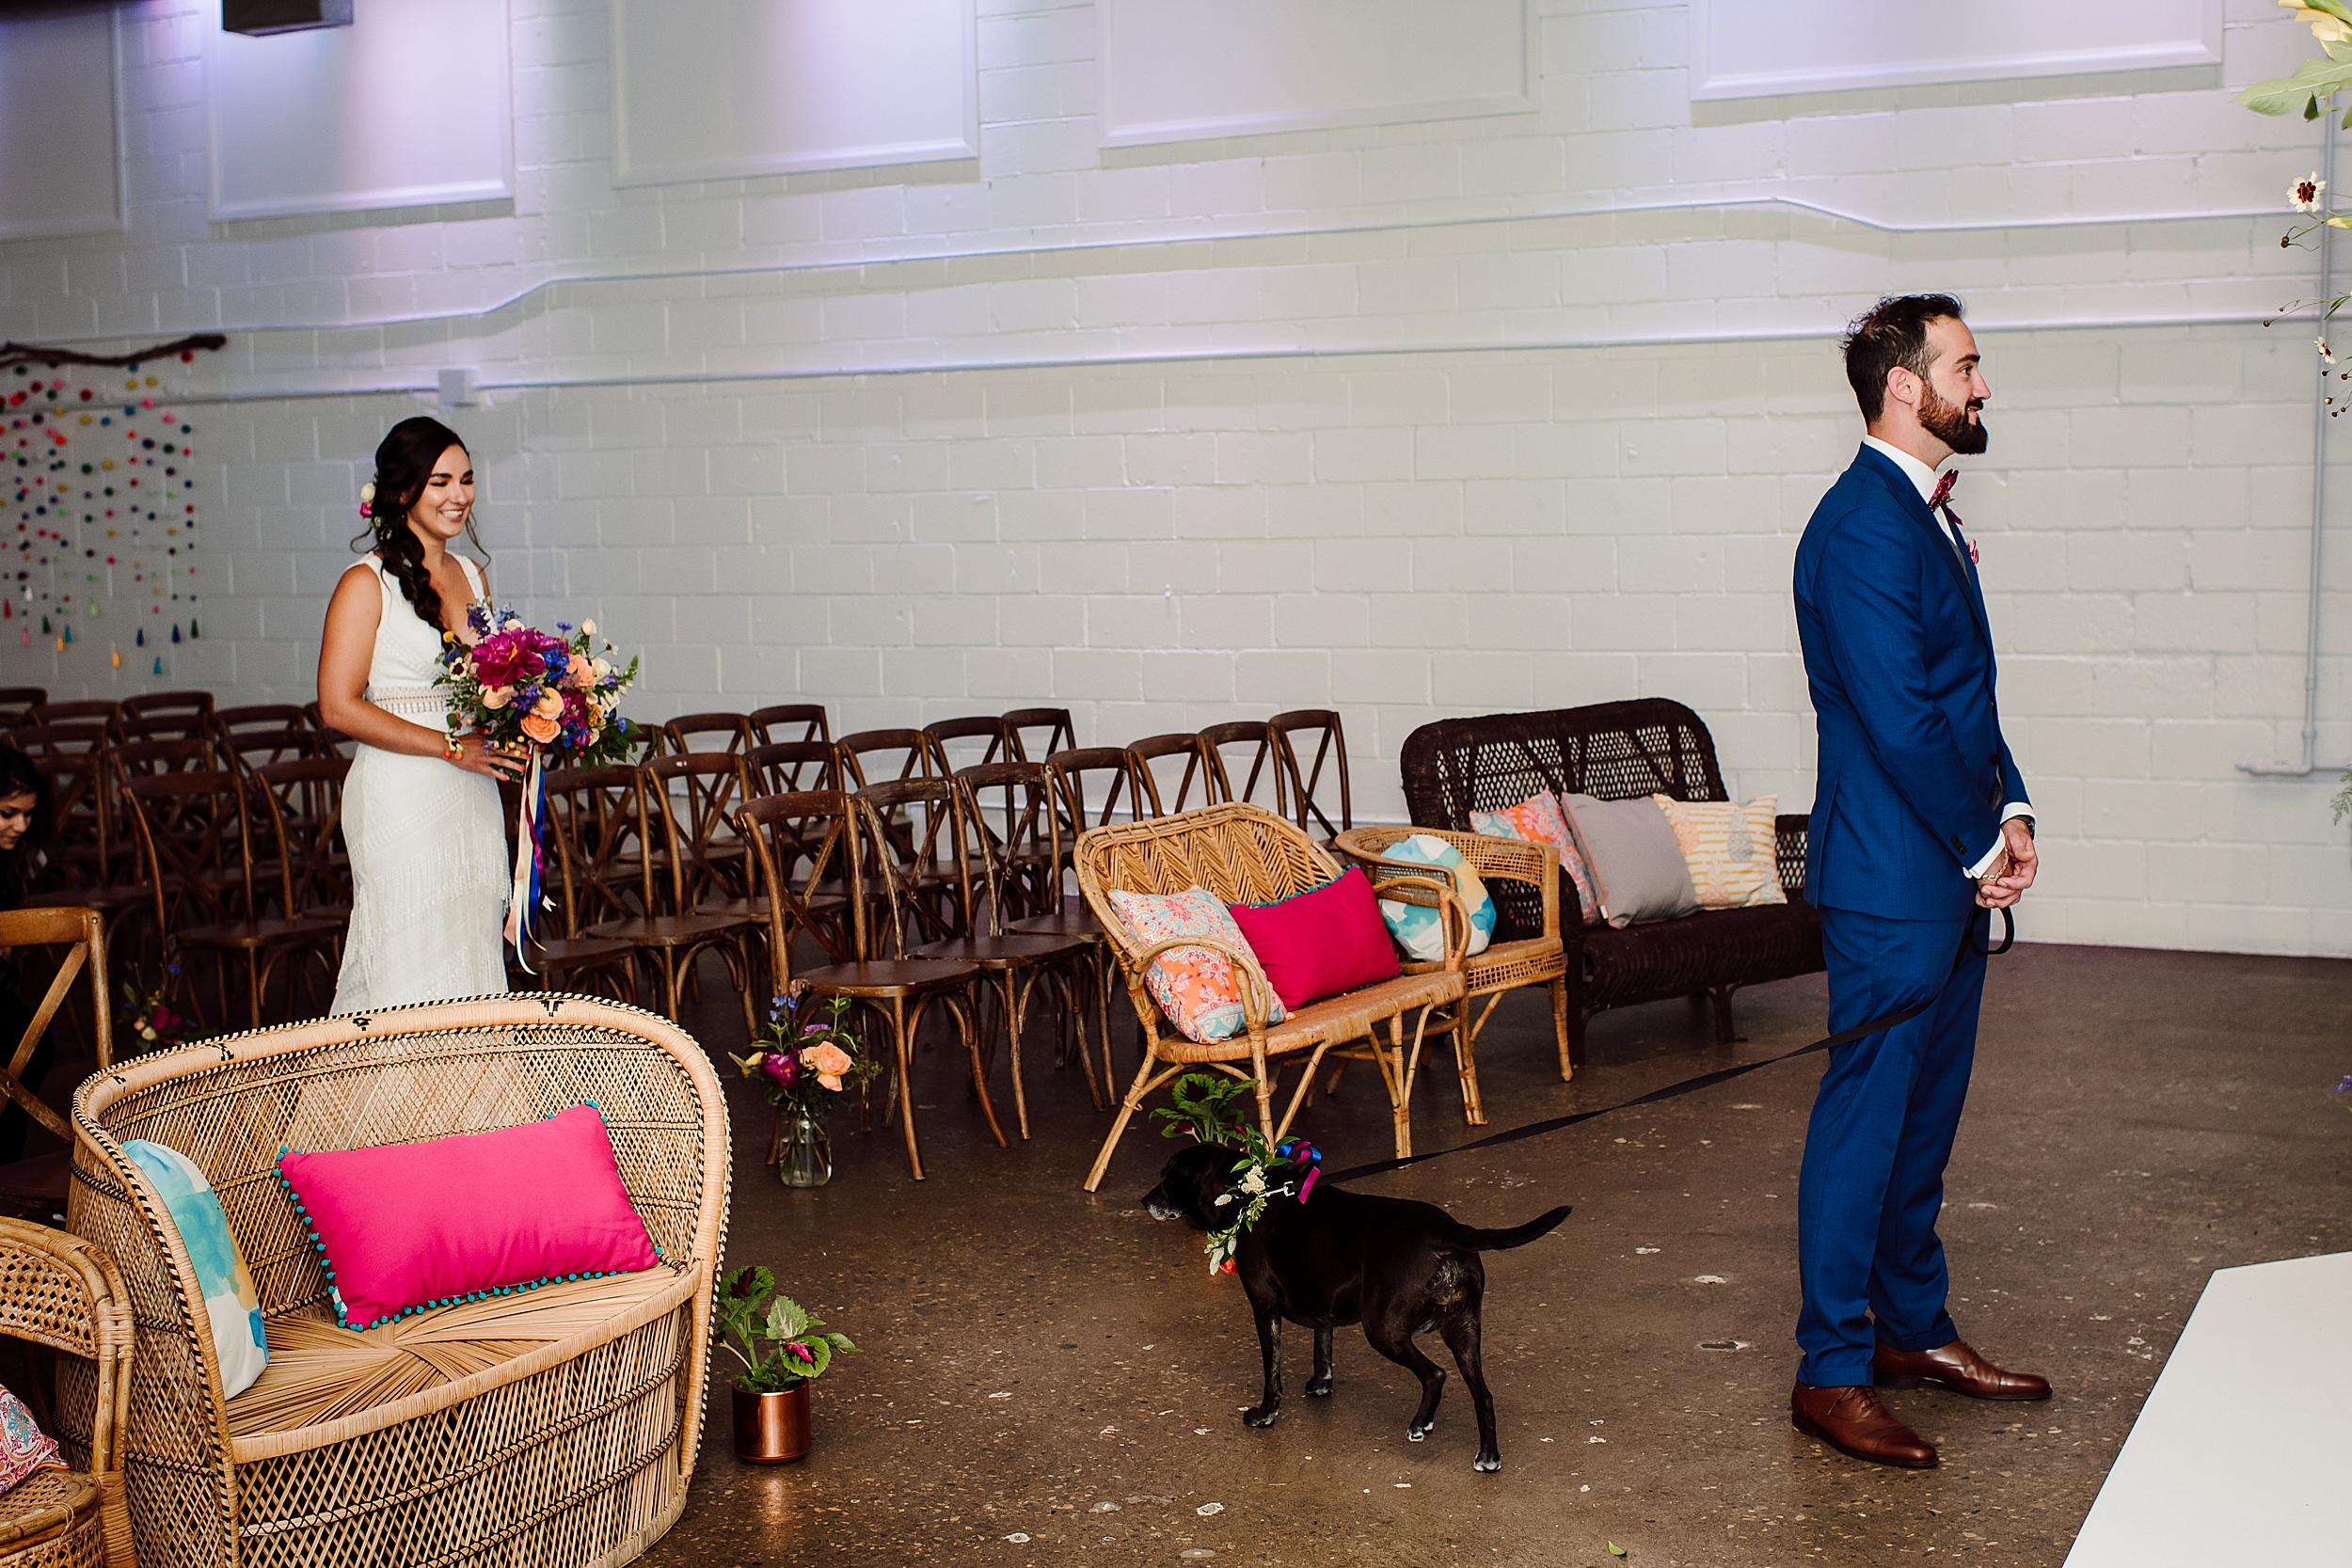 Airship-37-Berkeley-Events-Distillery-District-Wedding-Toronto-Wedding-Photographers_0030.jpg